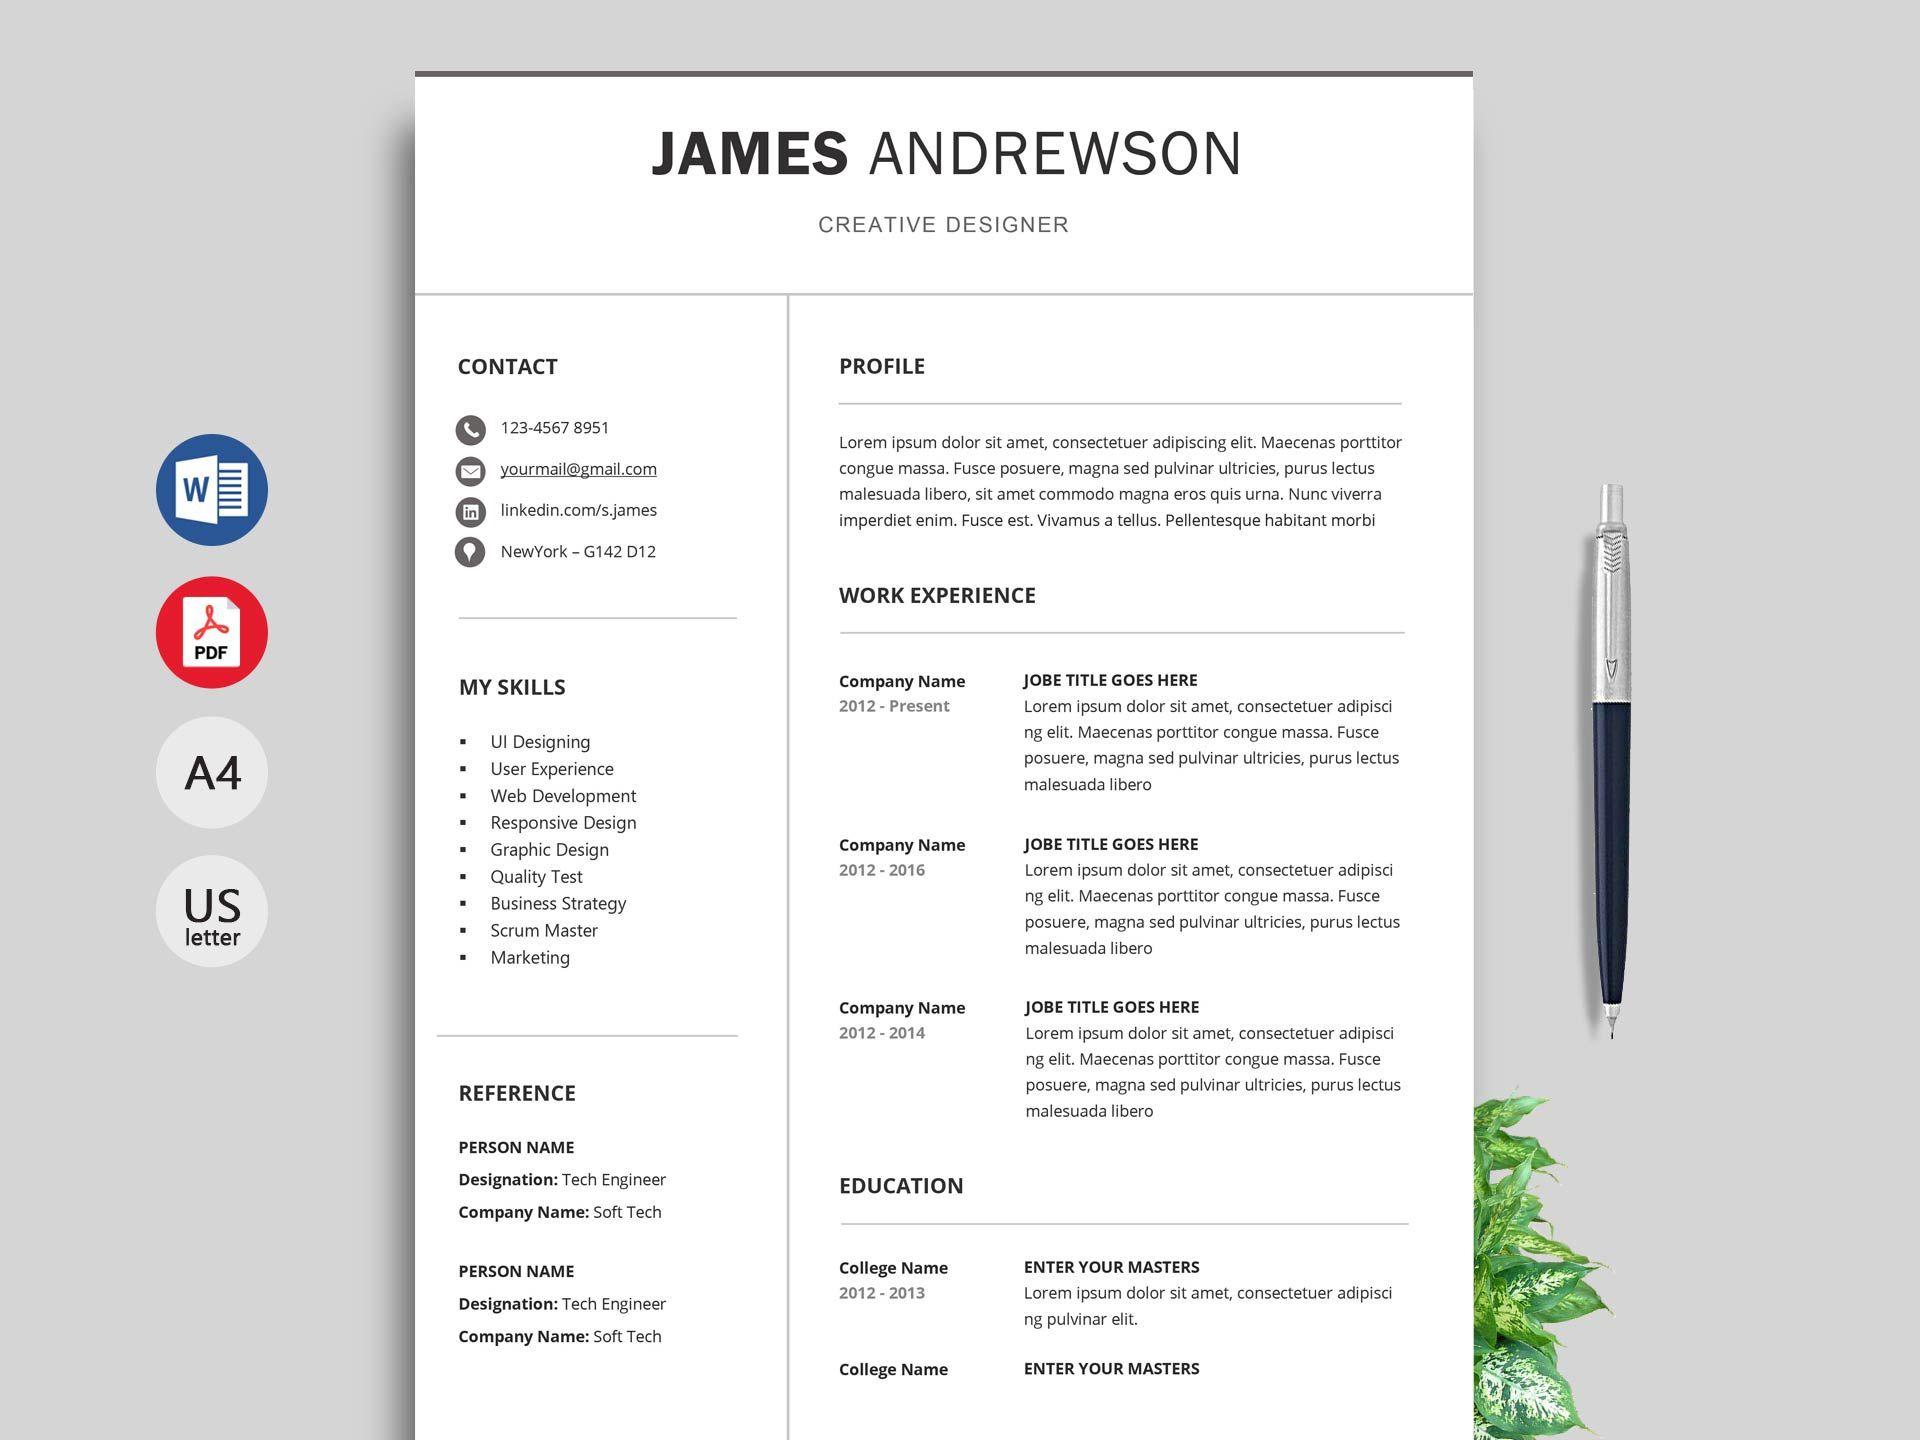 003 Phenomenal Free Professional Resume Template Microsoft Word Inspiration  Cv 2010Full